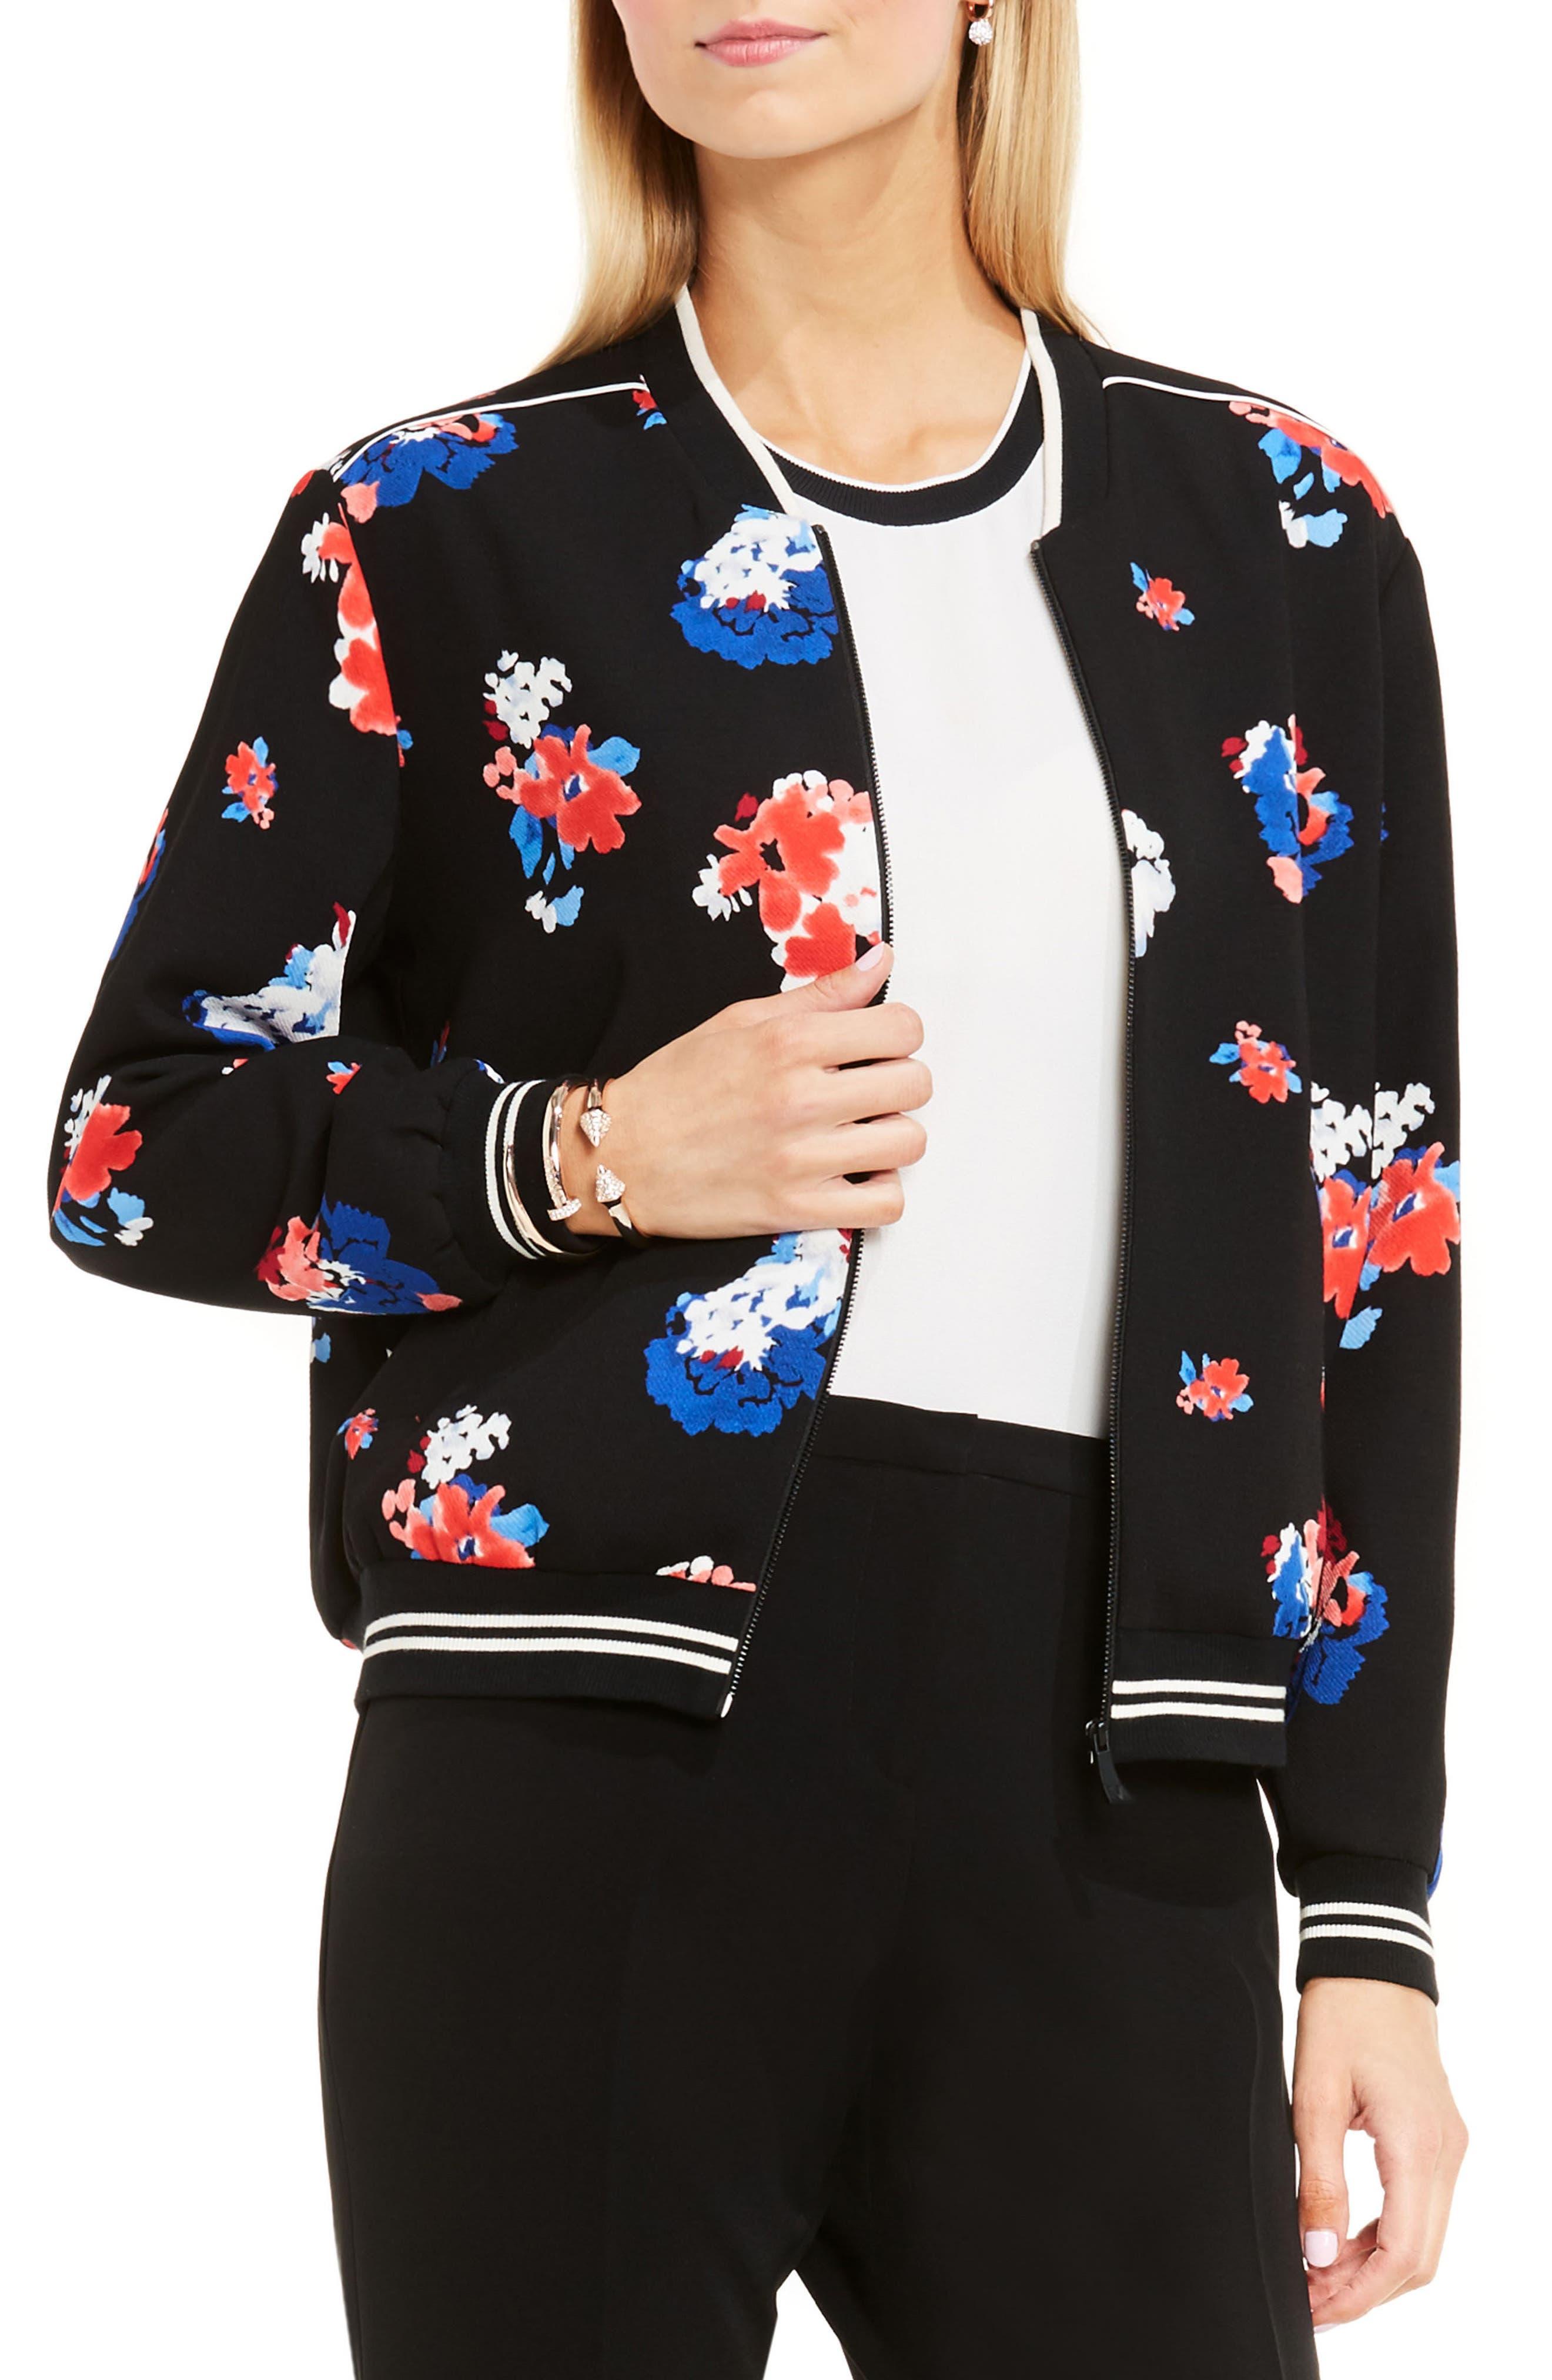 Alternate Image 1 Selected - Vince Camuto Travelling Blooms Bomber Jacket (Regular & Petite)